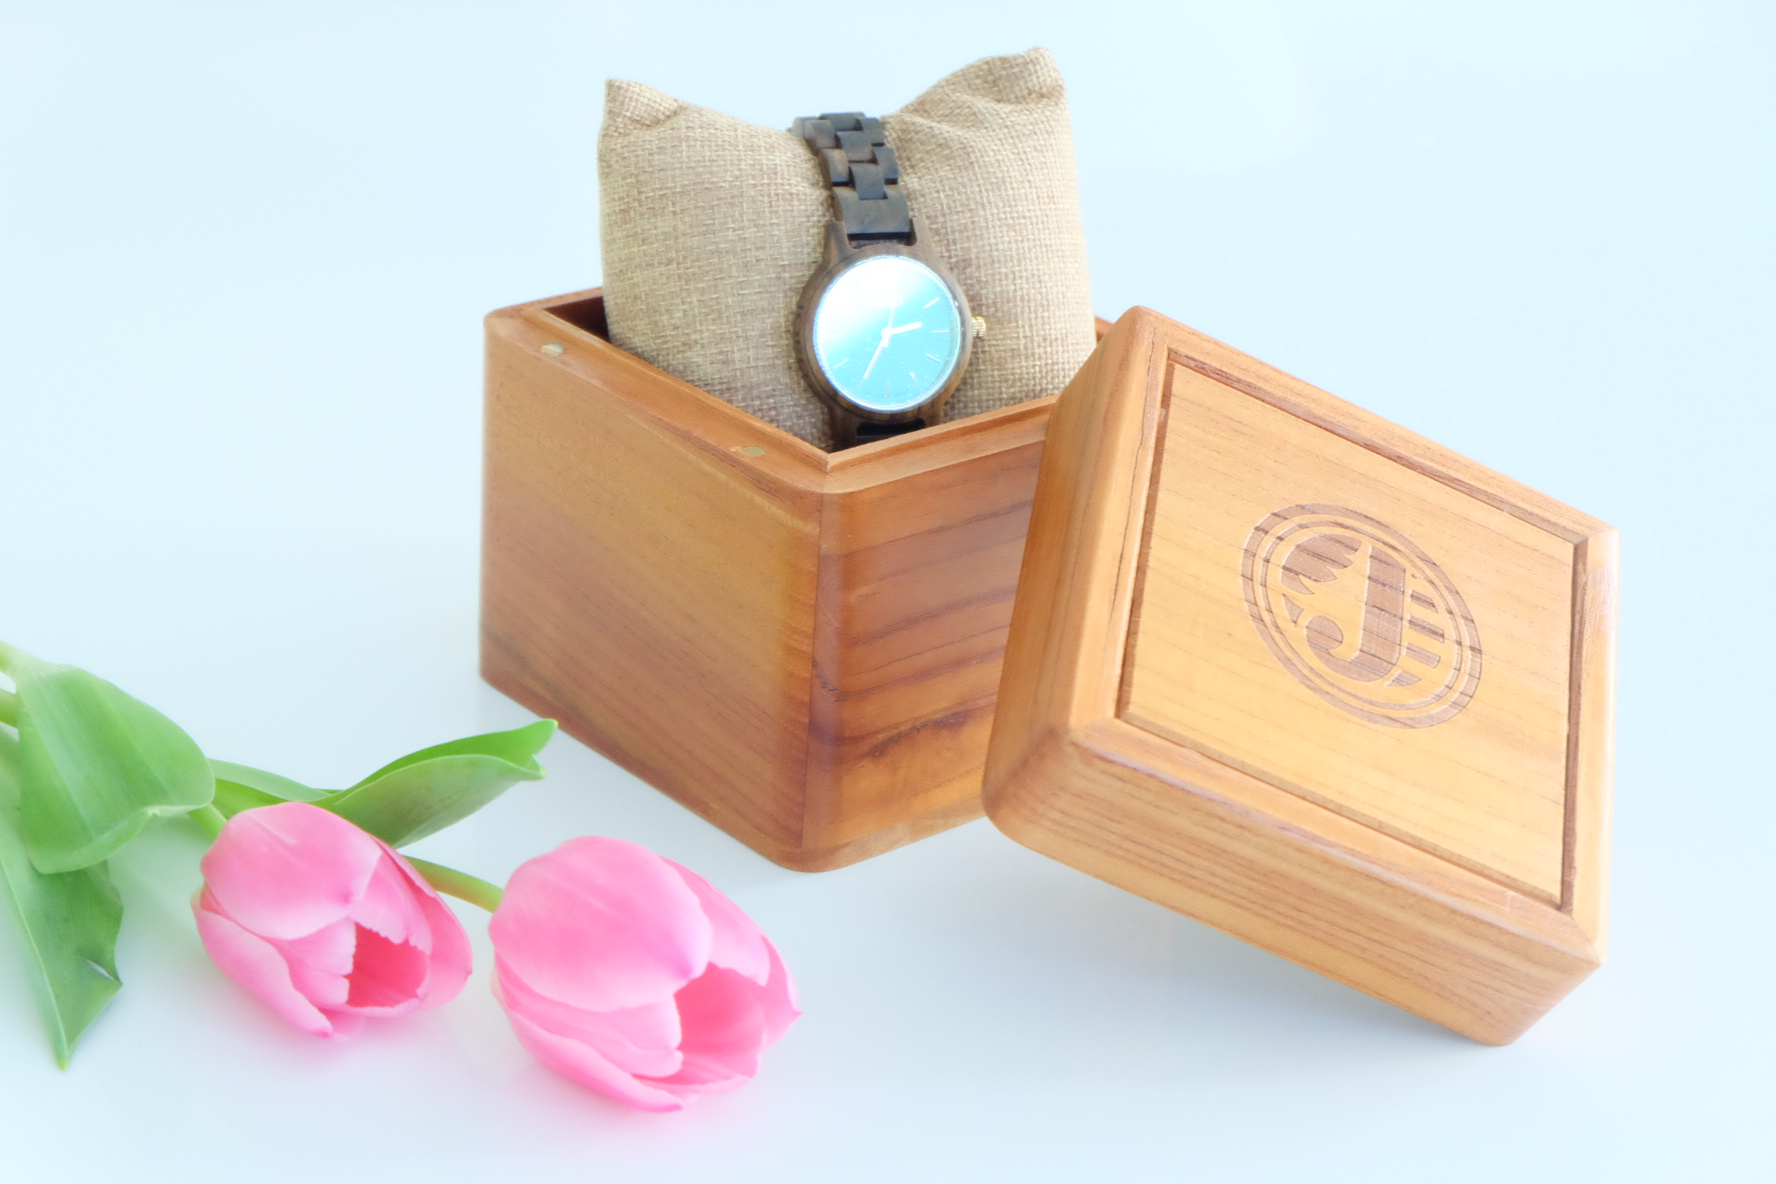 wood-watch-jord-image